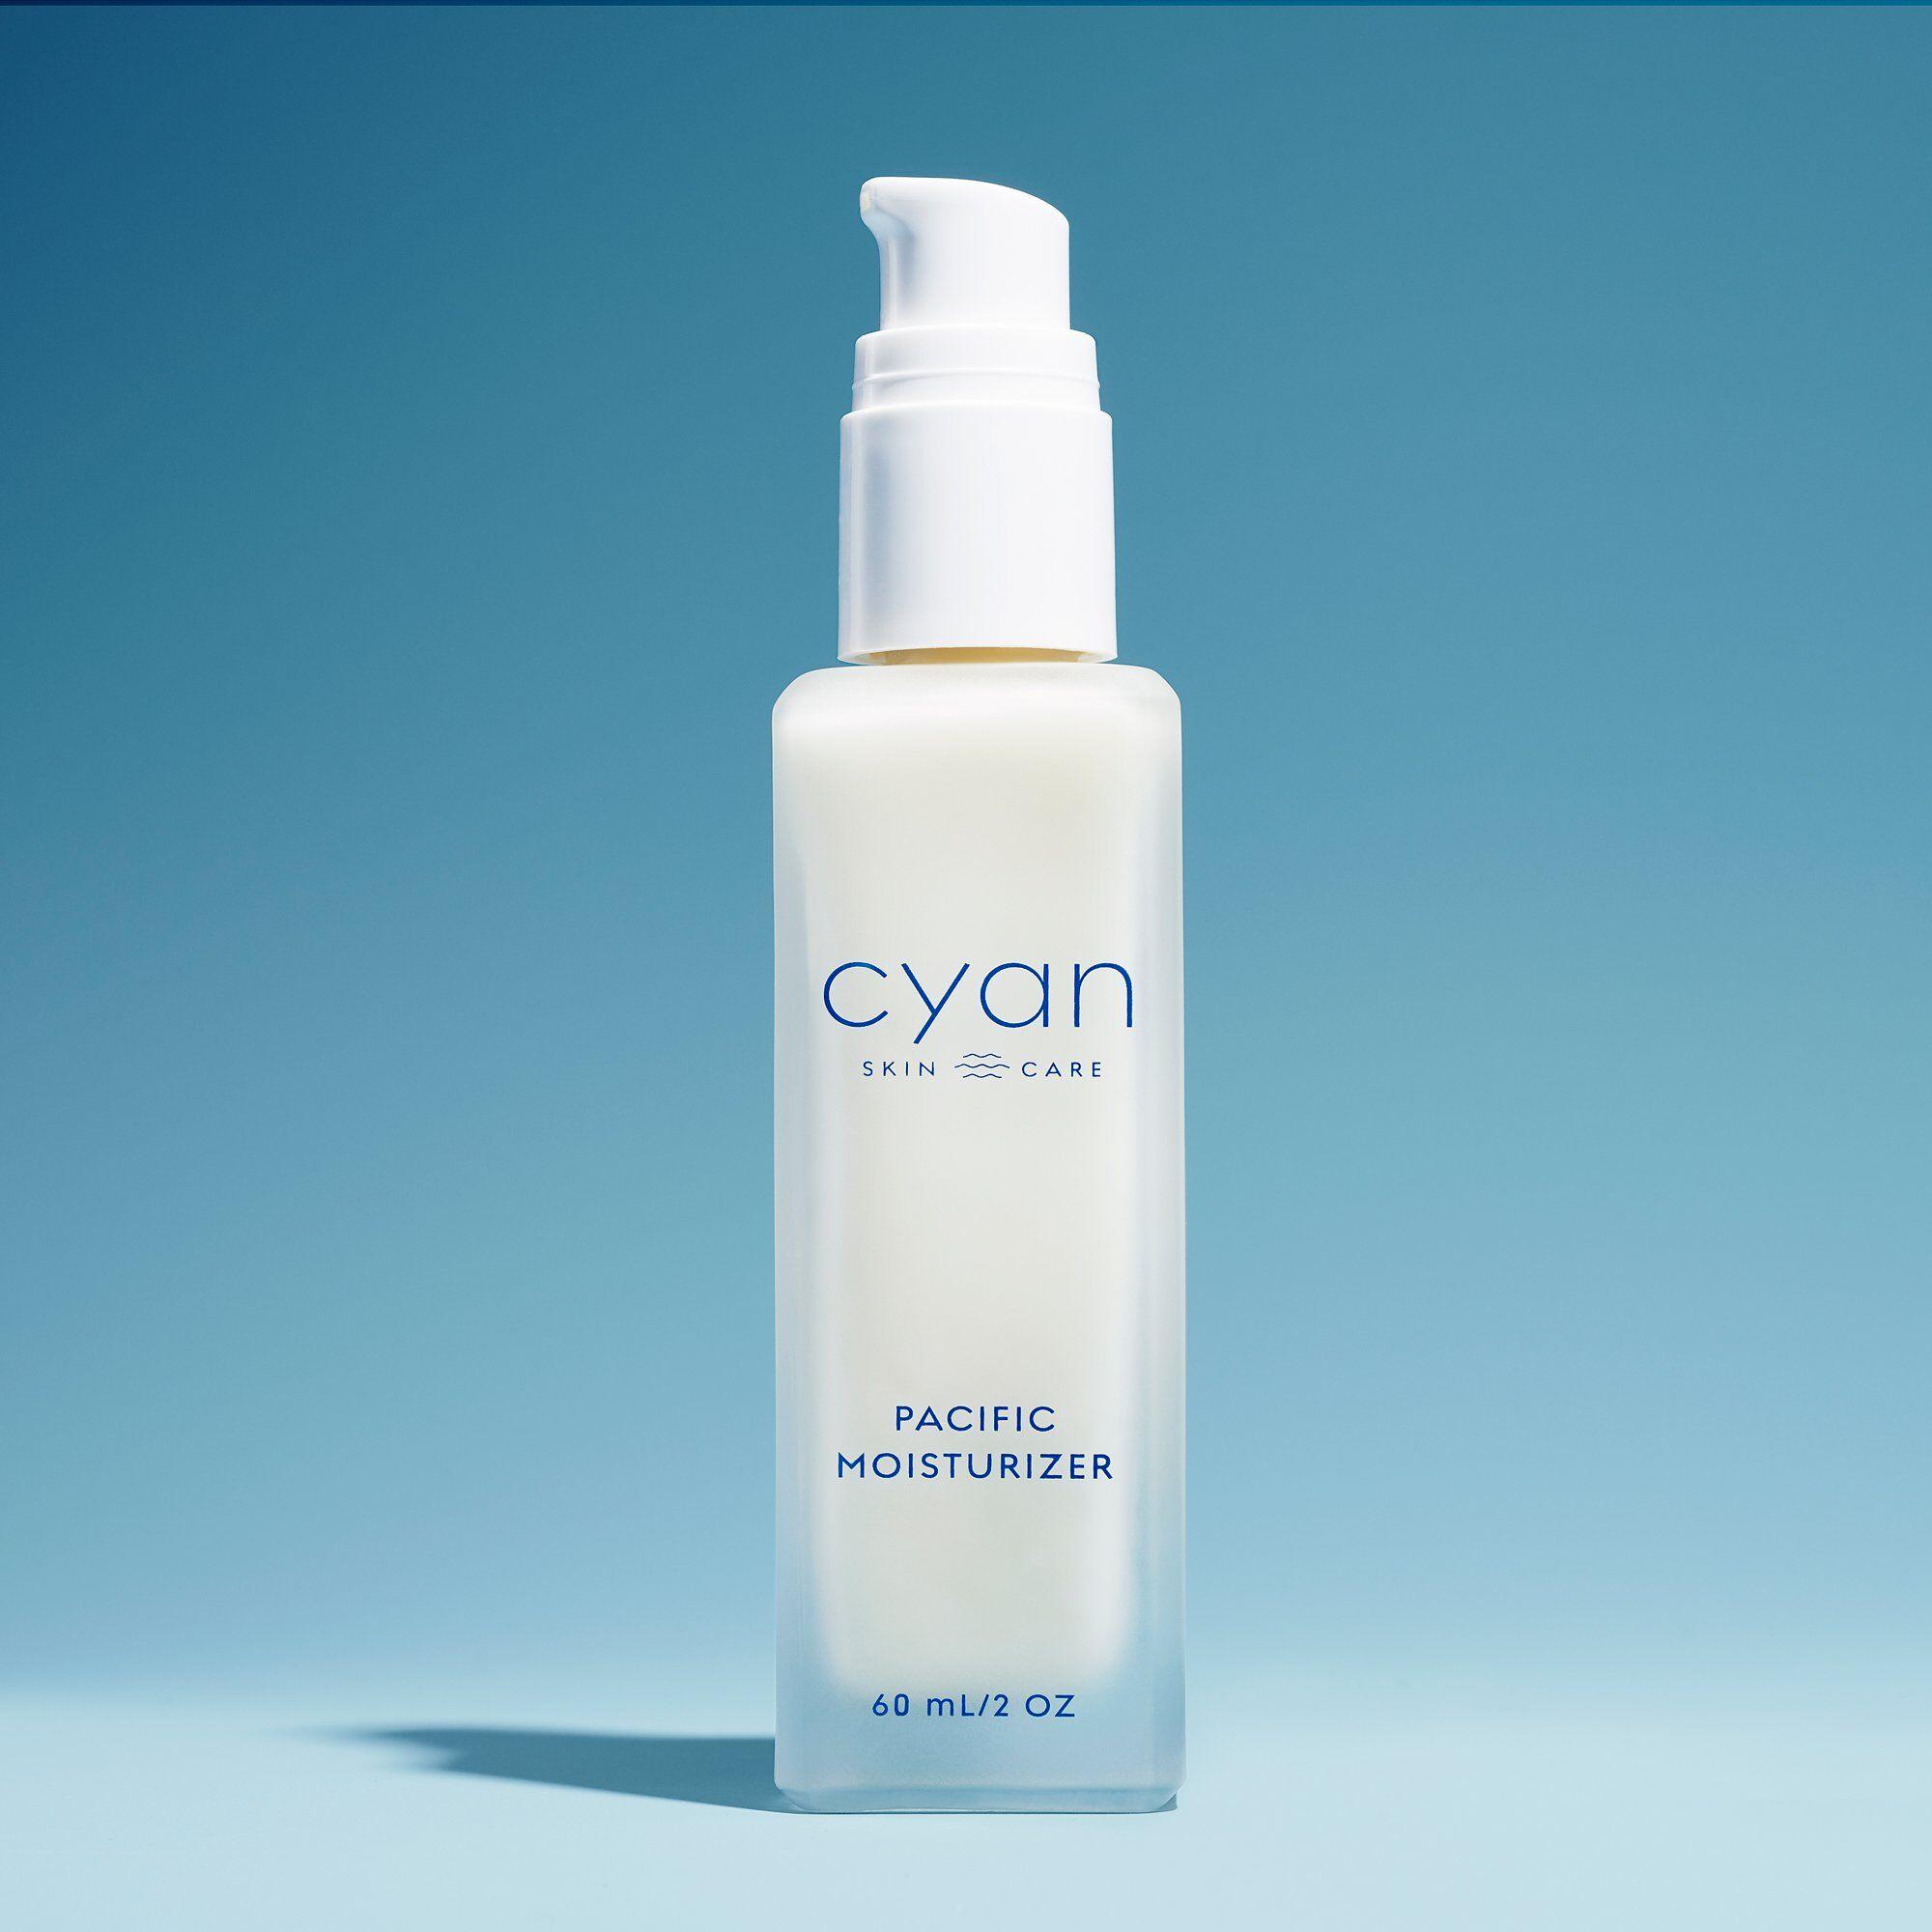 Cyan SkinCare - Pacific Moisturizer